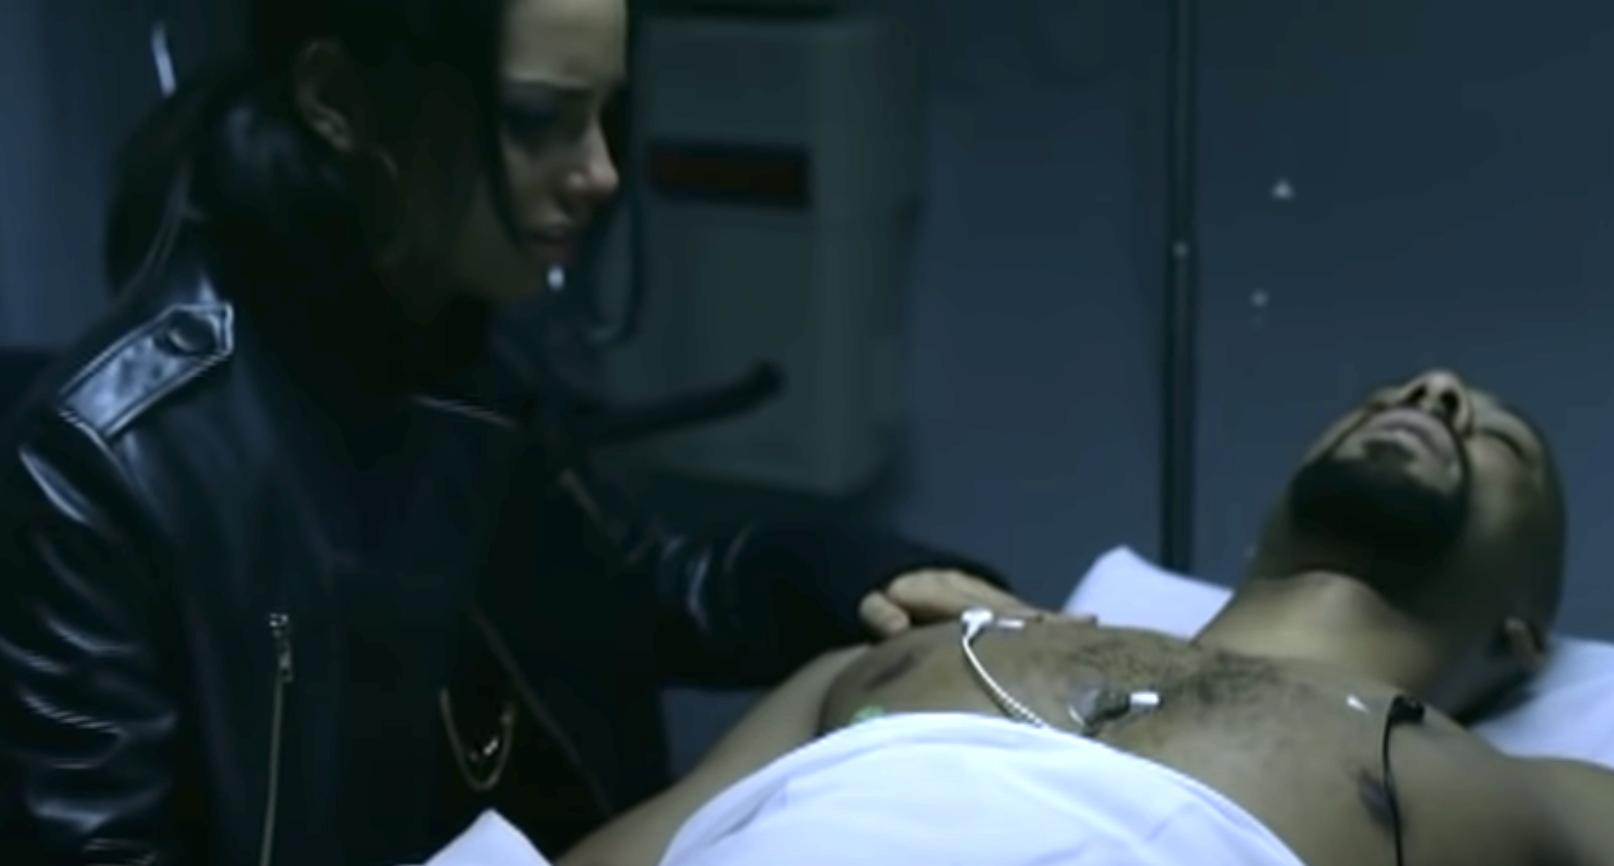 girlfriend over her boyfriend's body in the hospital